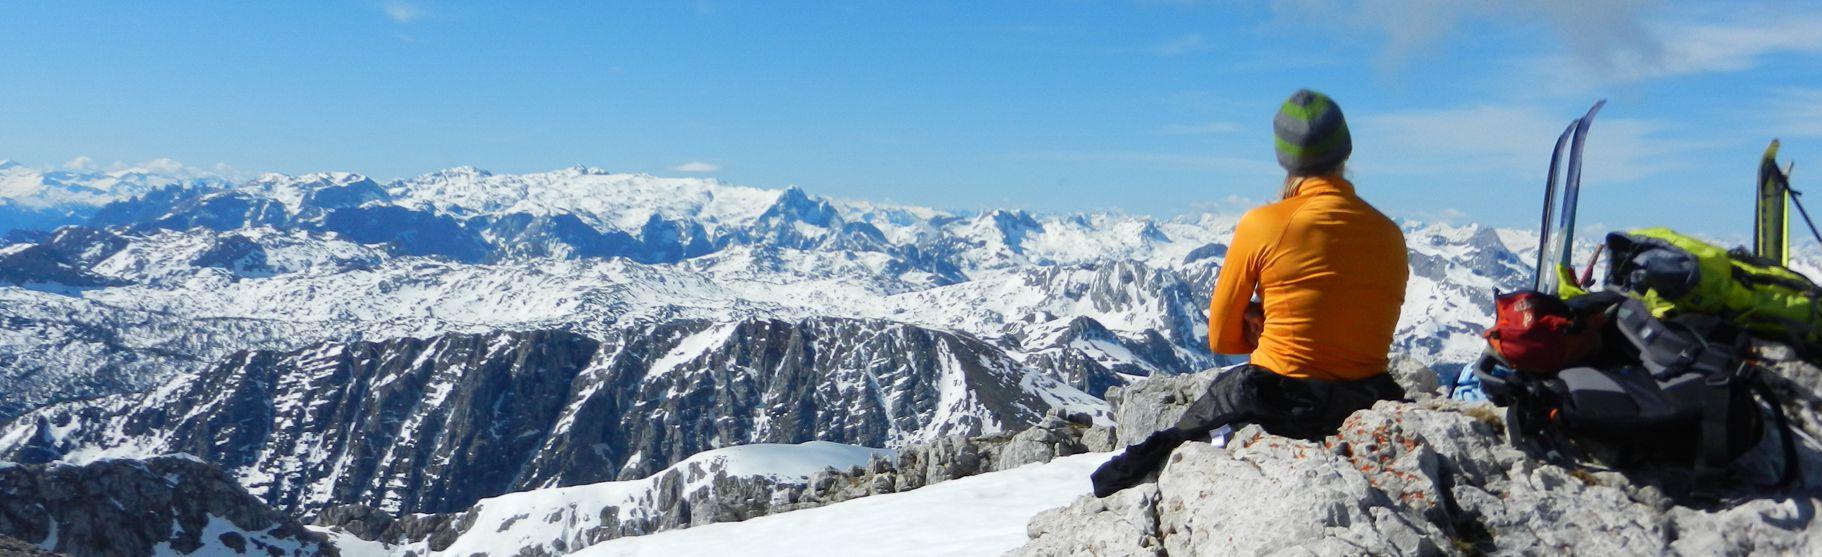 bergpanorama-winter.jpg